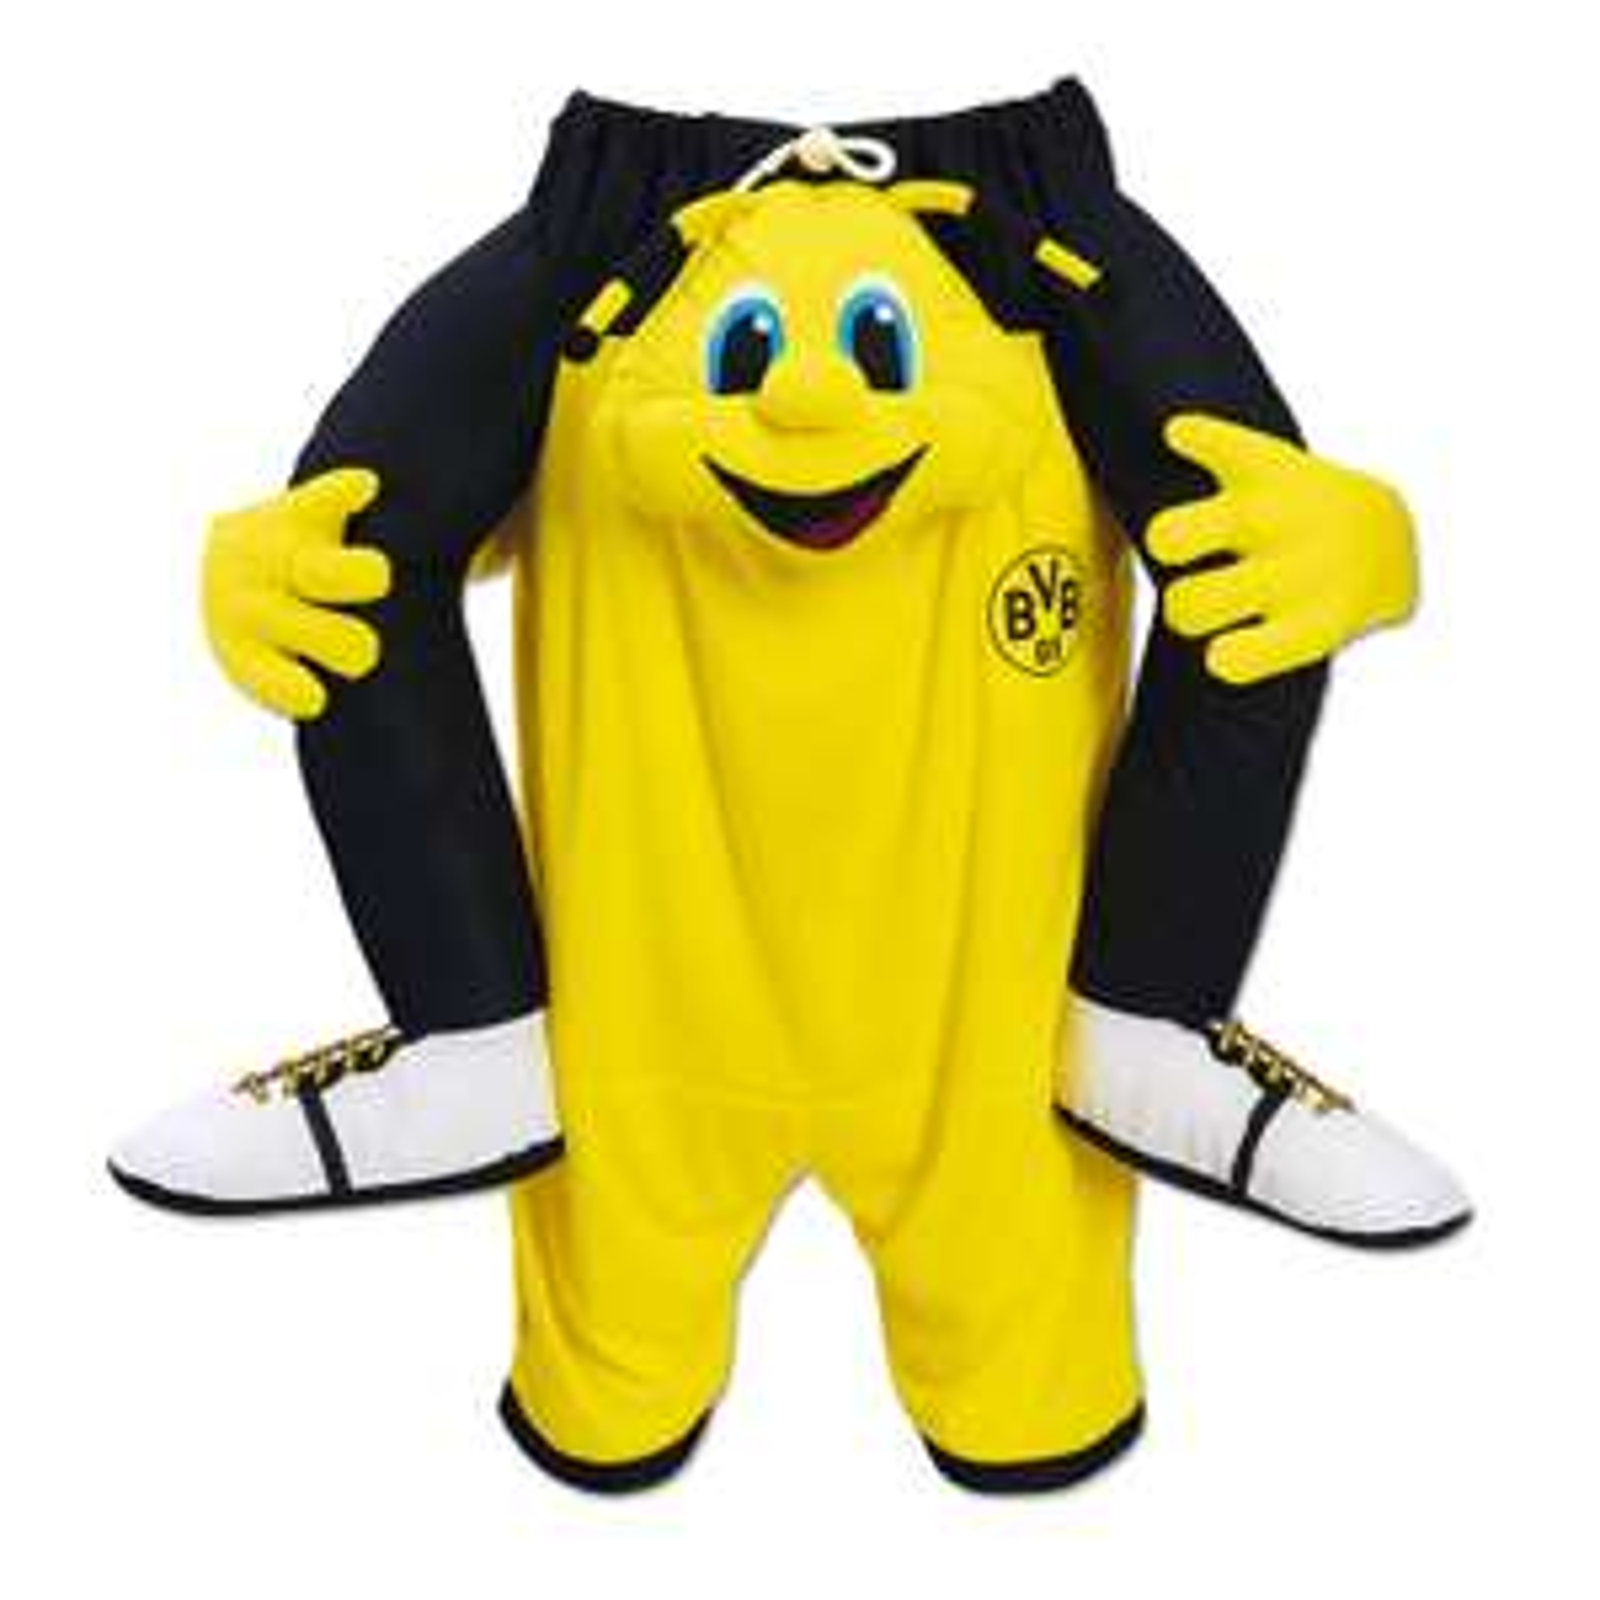 BVB Borussia Dortmund Huckepack Kostüm EMMA für 19,99€ @ BVB